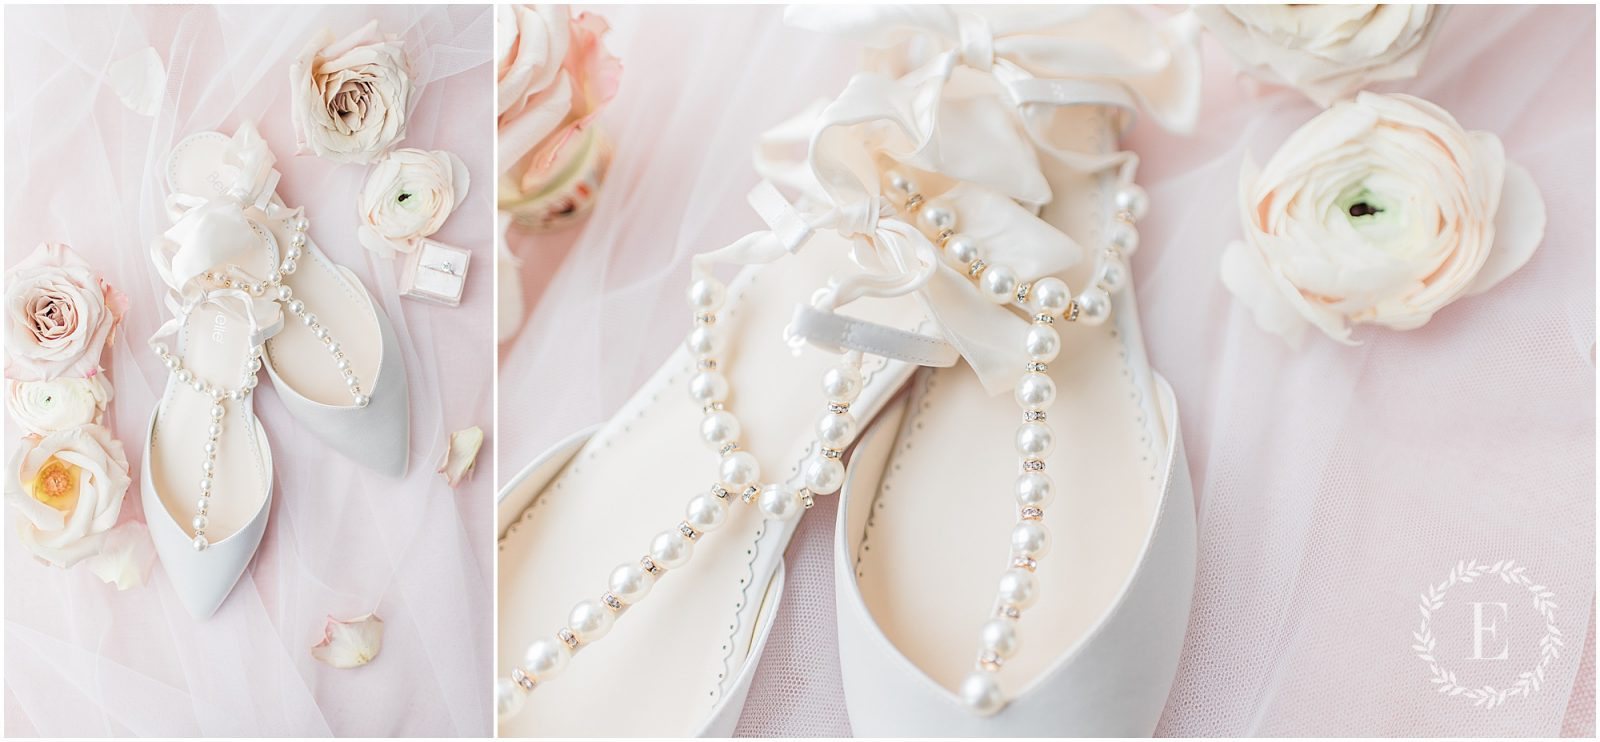 34 - Bella Belle for Fairy Dreams Bridal - PhotosbyEmmaH 2019.jpg